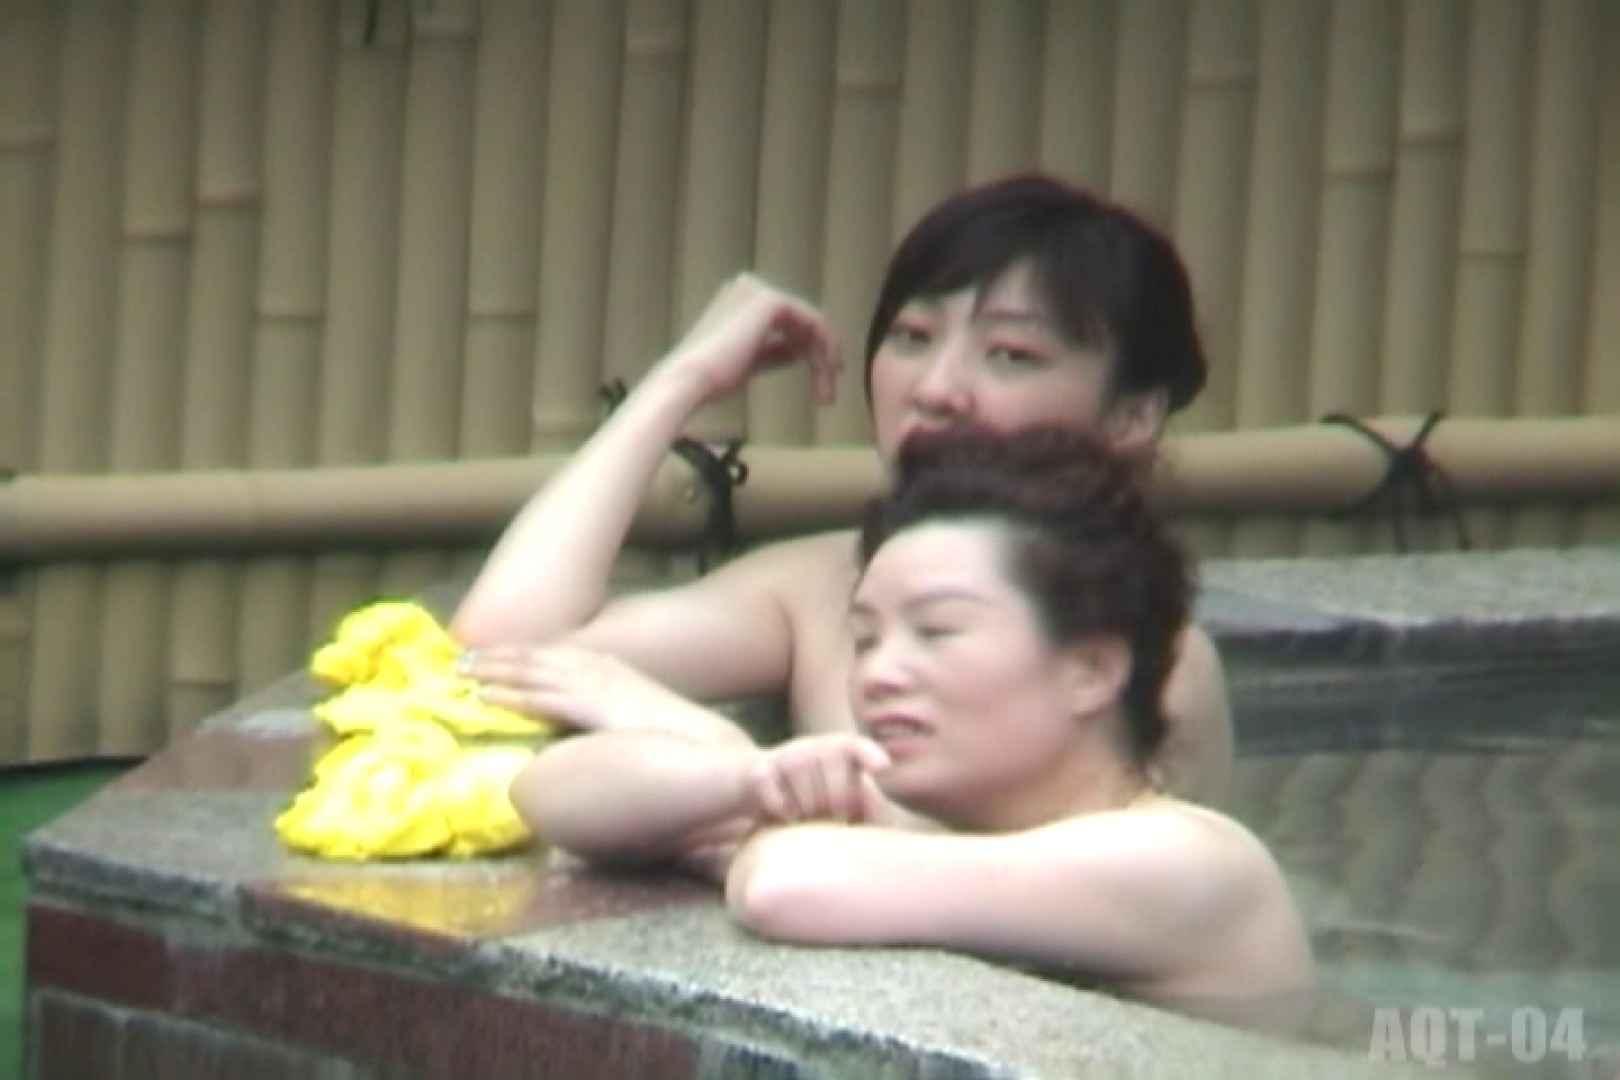 Aquaな露天風呂Vol.743 OLセックス  108画像 48